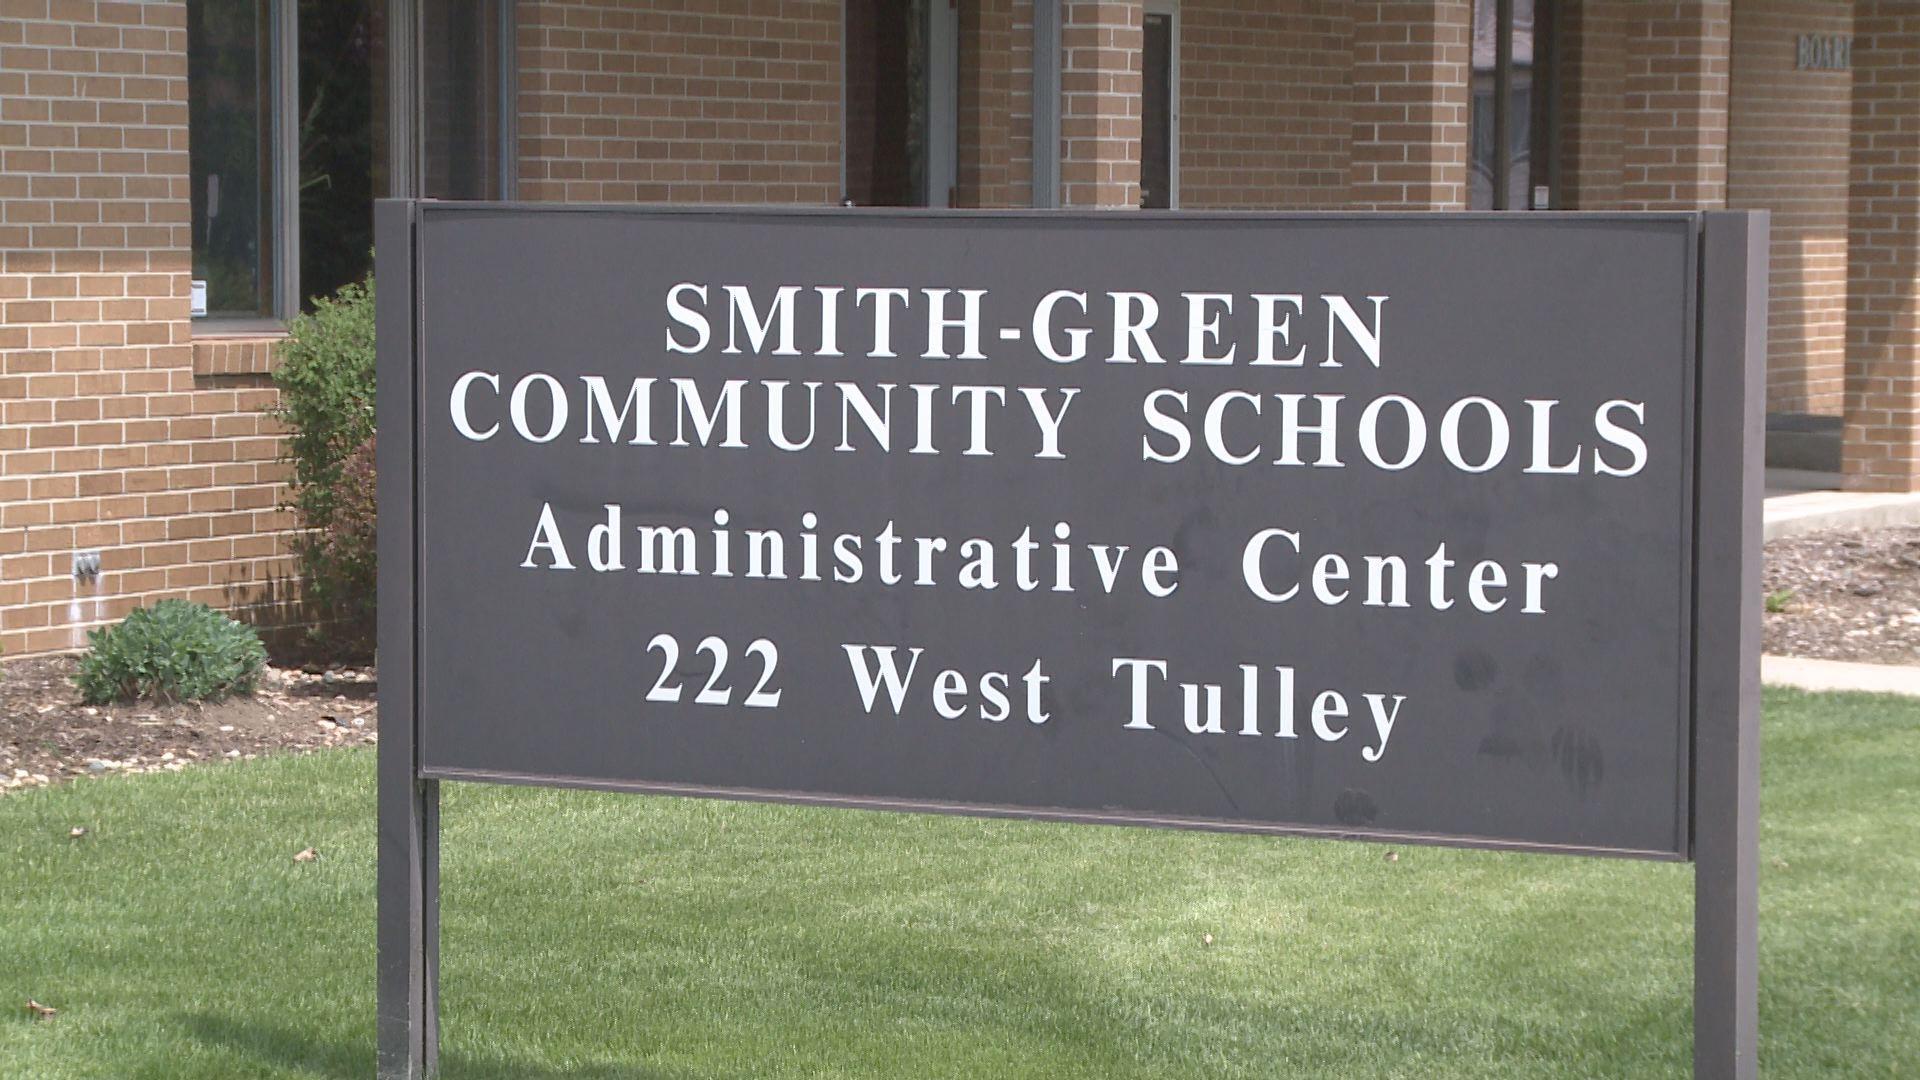 Smith Green Community Schools